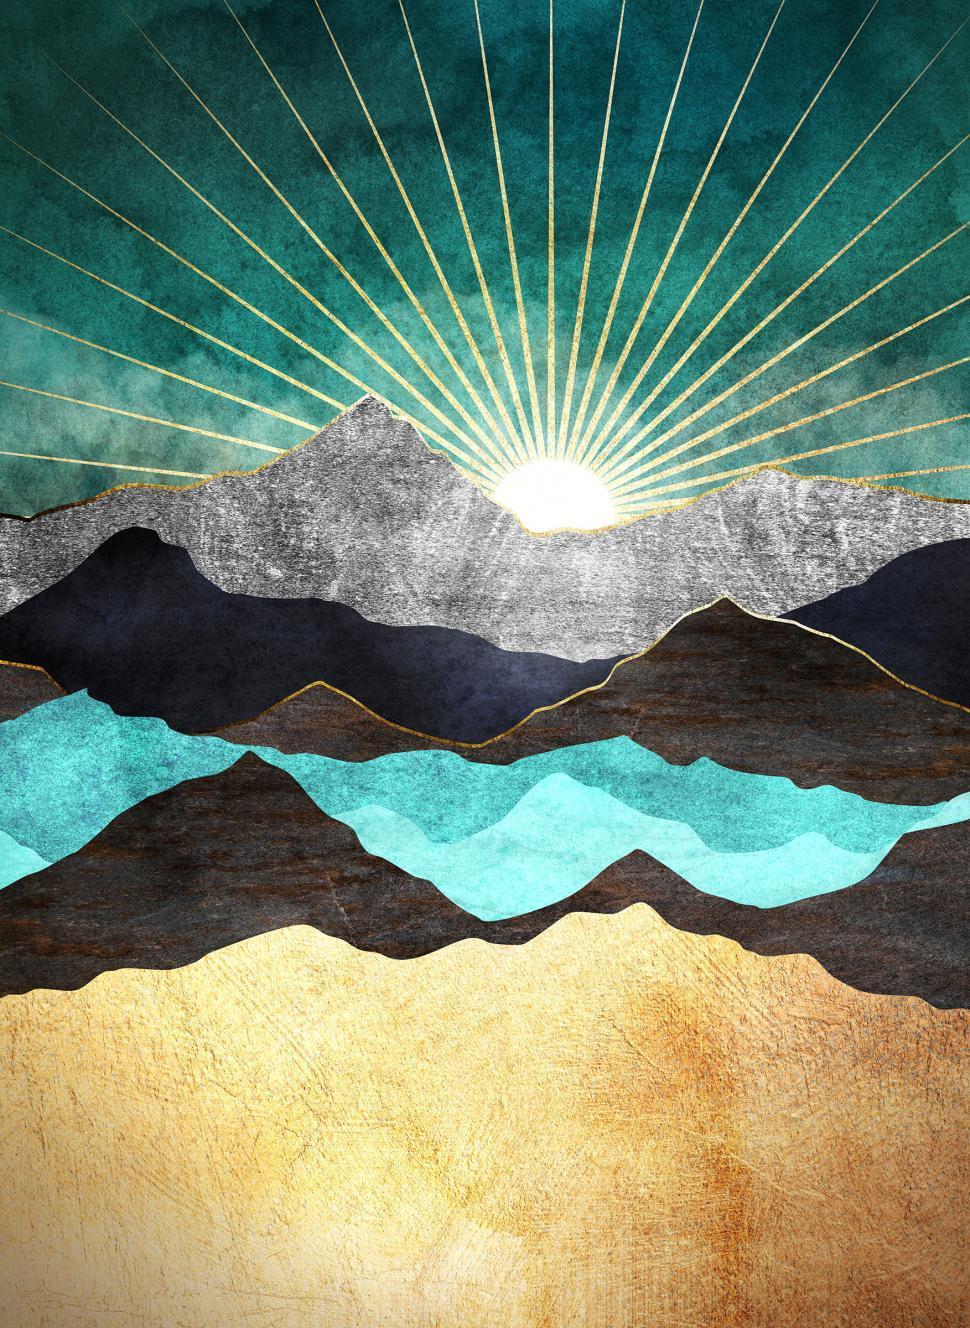 Download Free Stock Photo of Rising Sun over Metallic Mountains II